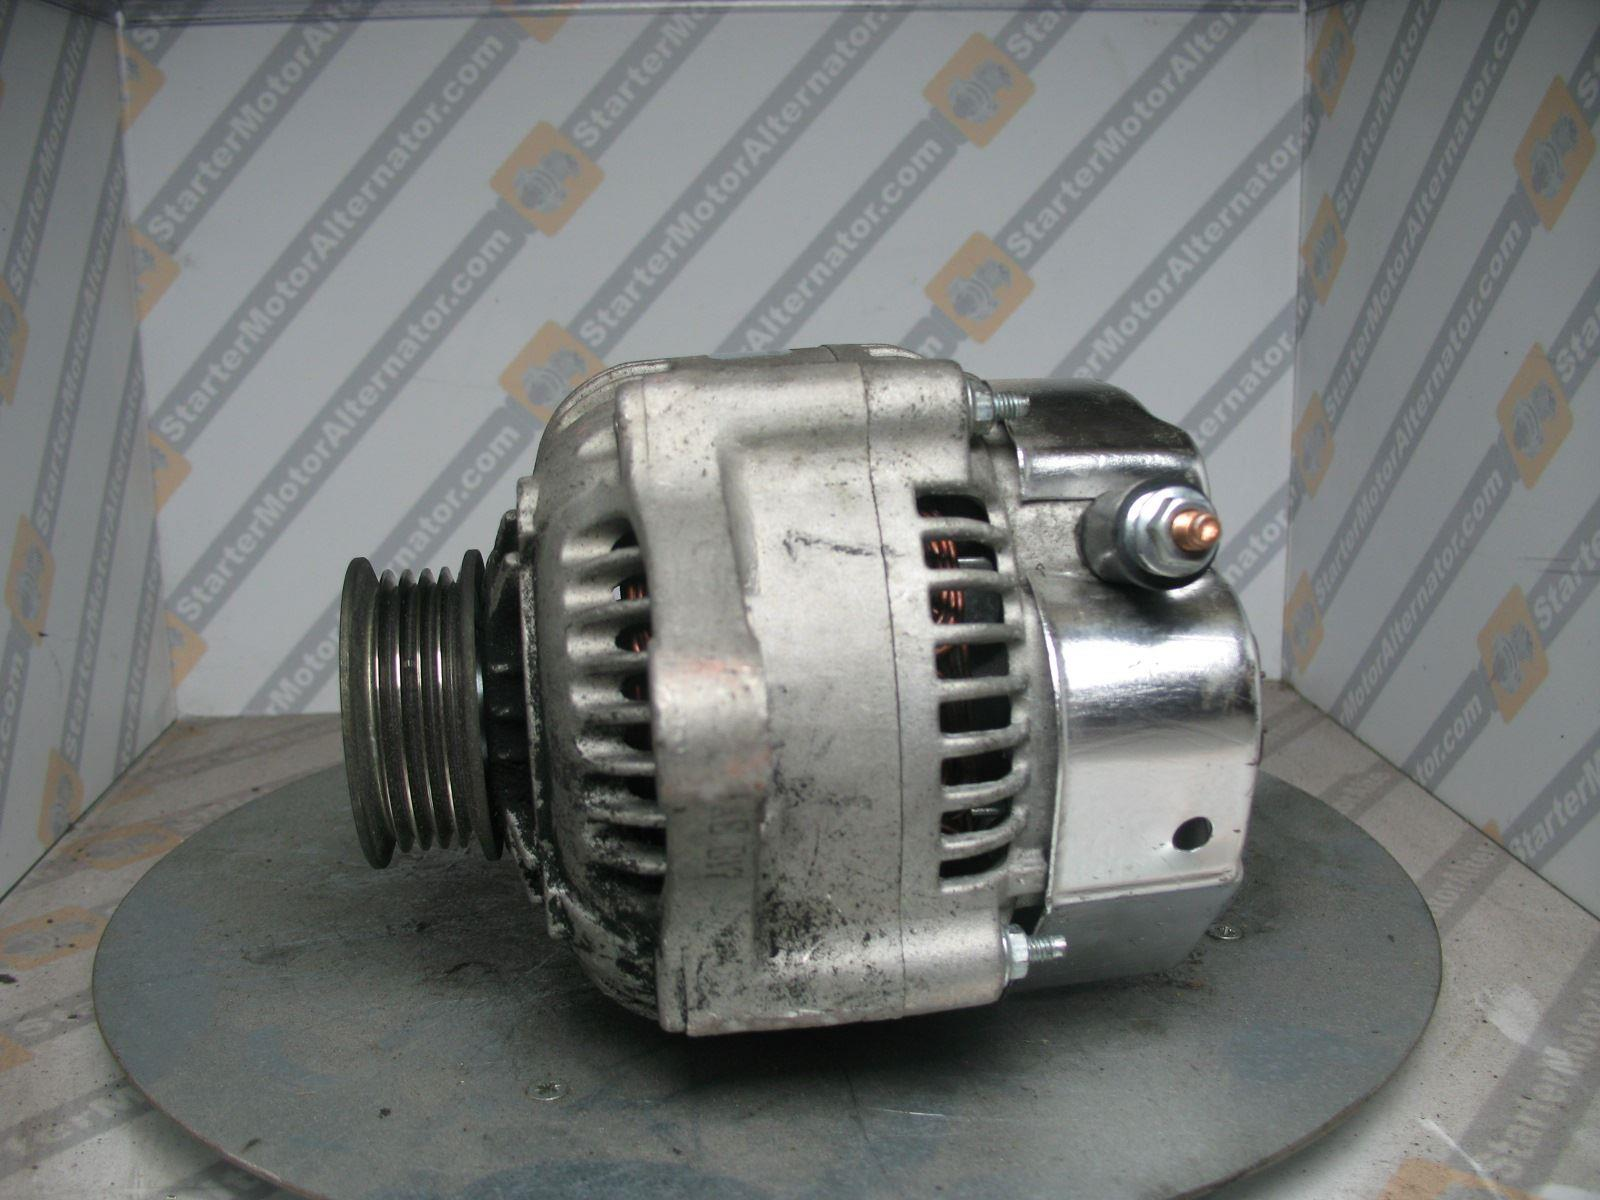 XIK1896 Alternator For Fiat / Opel / Suzuki / Vauxhall